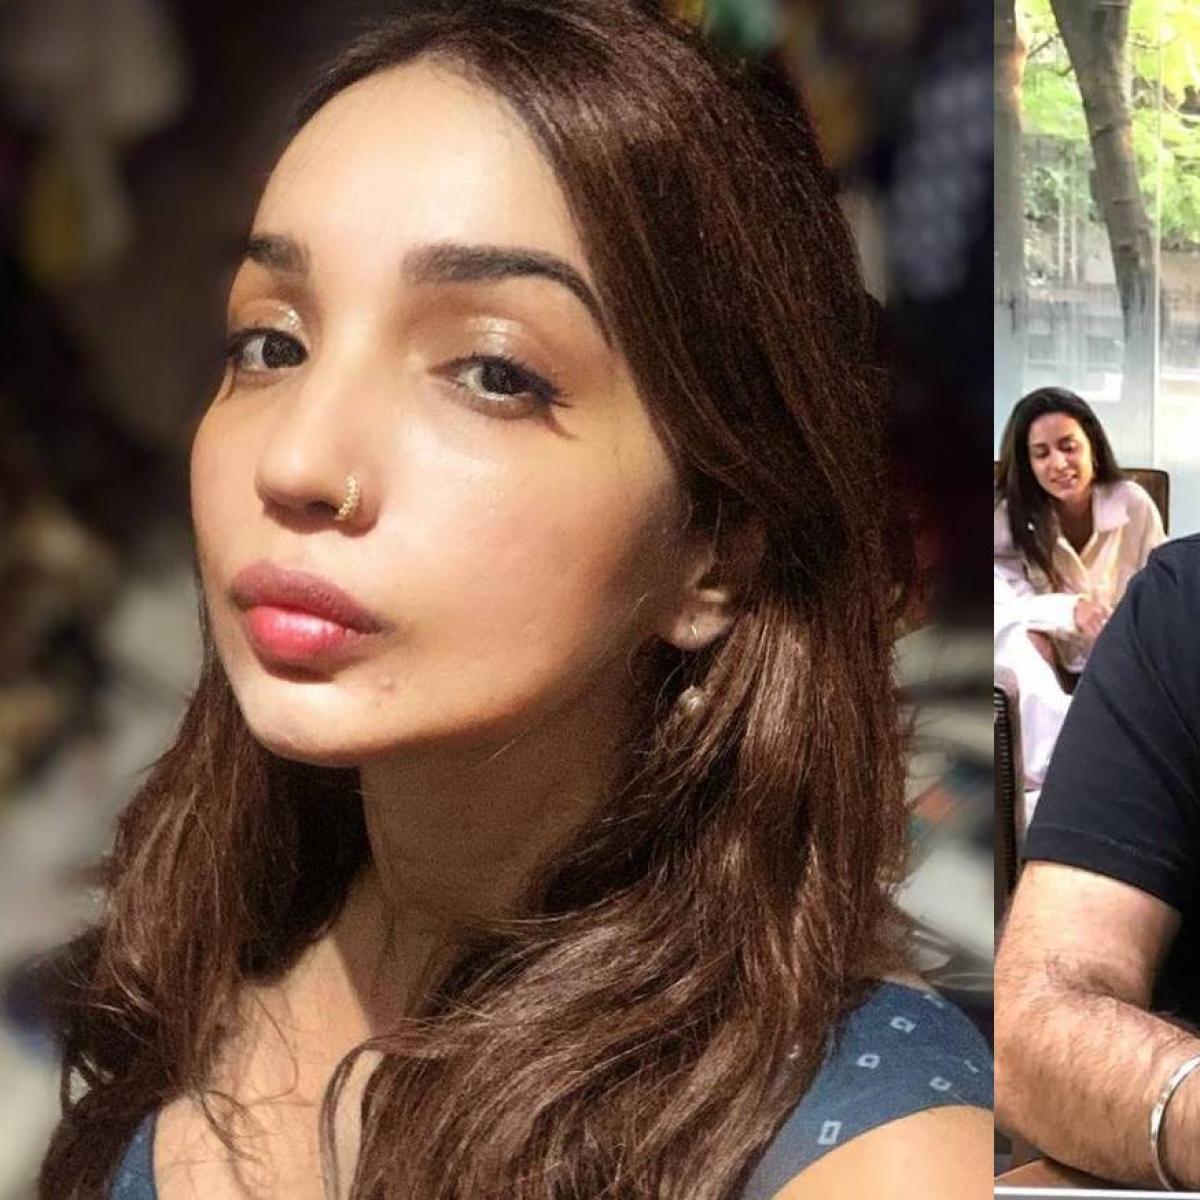 'Haseen Dillruba' writer Kanika Dhillon slams 'Jai Mummy Di' screenwriter for 'sexist misogynist' tweet